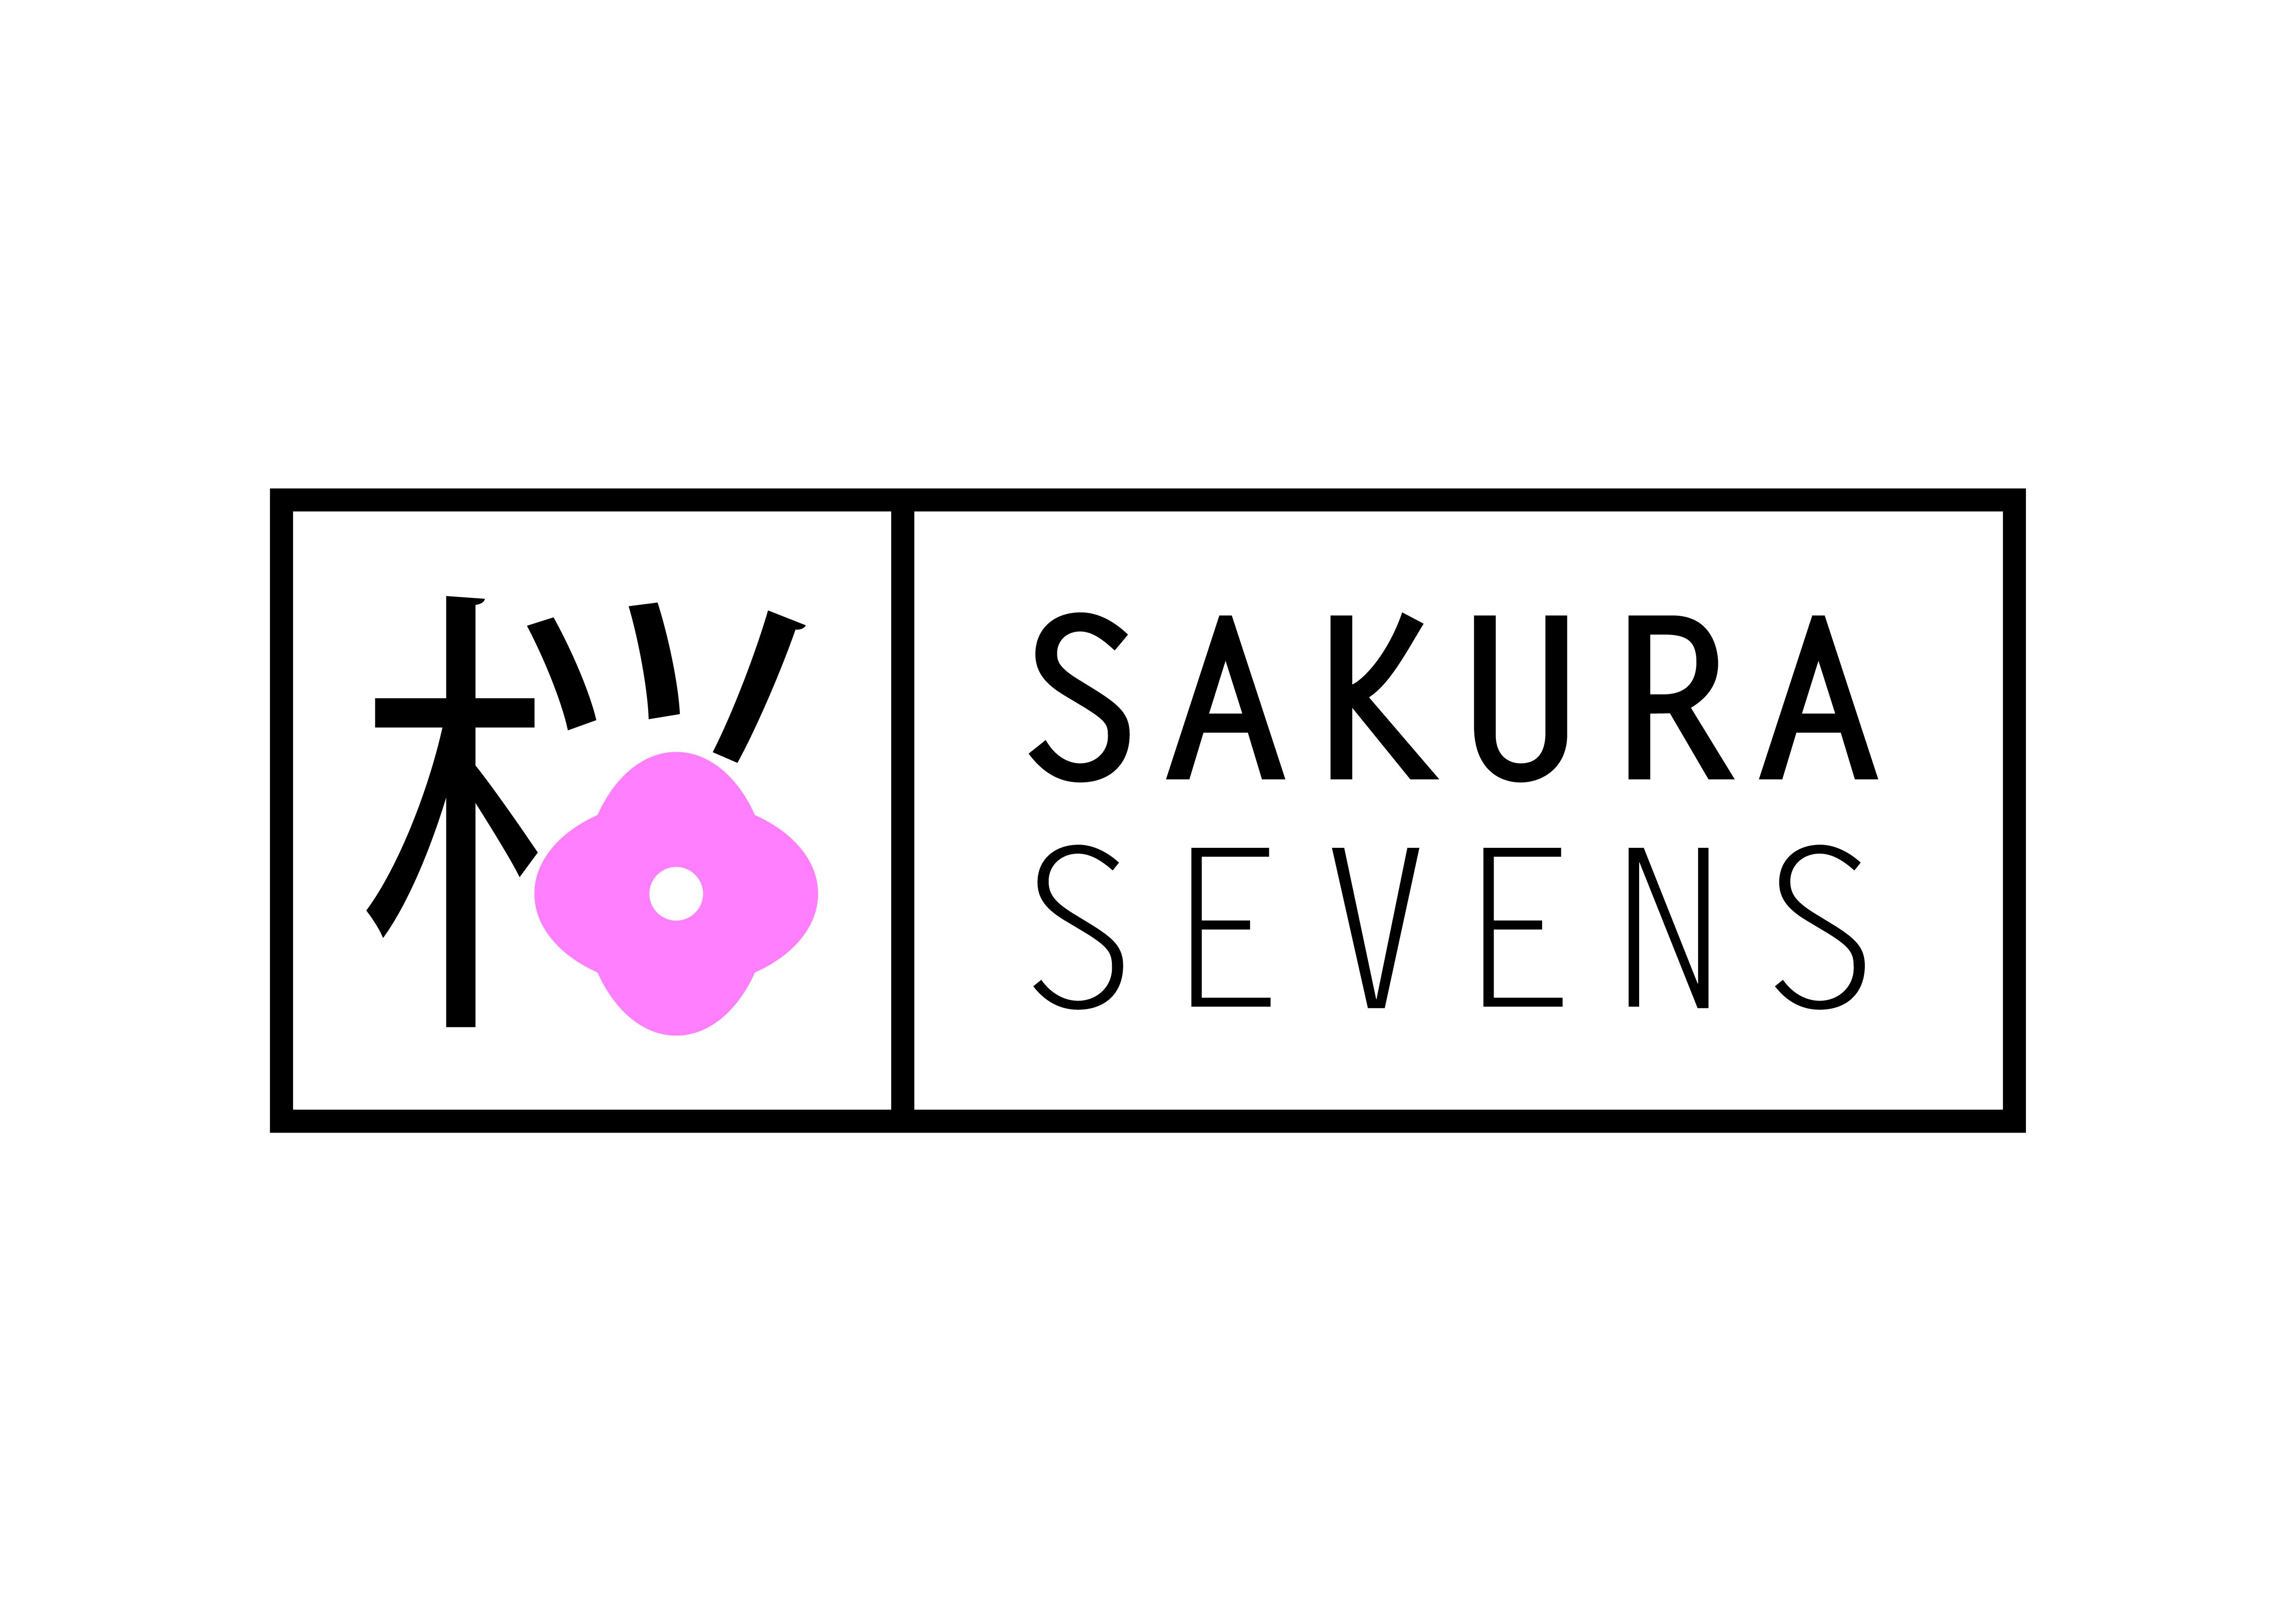 ssakura.geo.jp 女子セブンズ日本代表(サクラセブンズ)HSBCワールドラグビー女子セブンズシリーズ2017-2018 第2戦  オーストラリア大会遠征メンバー|RUGBY:FOR ALL「ノーサイドの ...